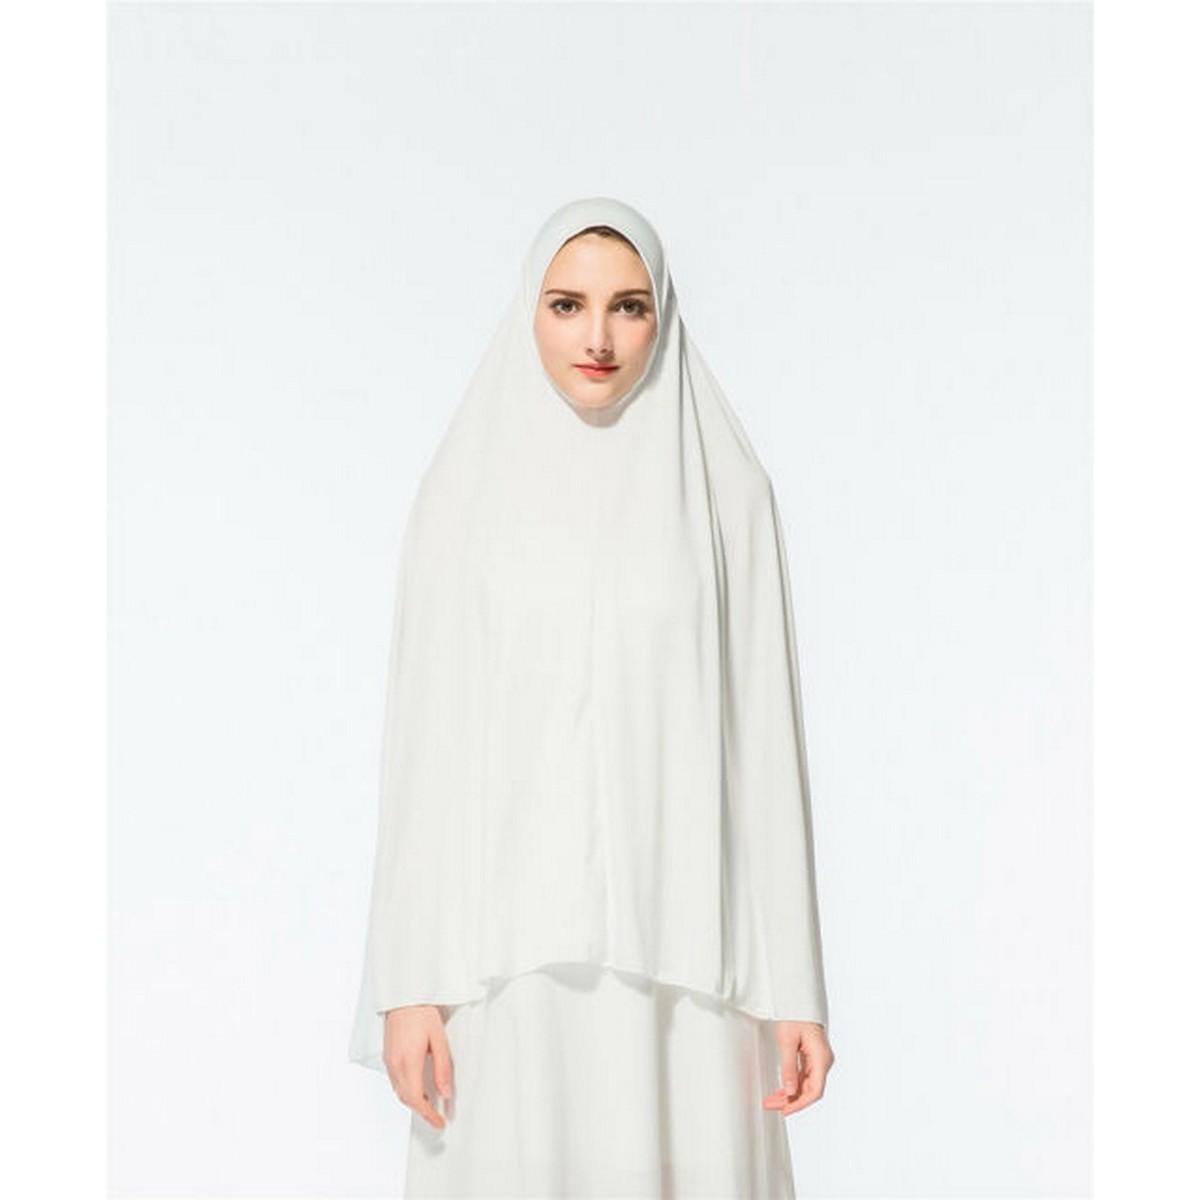 Cotton Jersey Egyptian Prayer Long Scarf Hijab Islamic Large Overhead Shawls Wrap